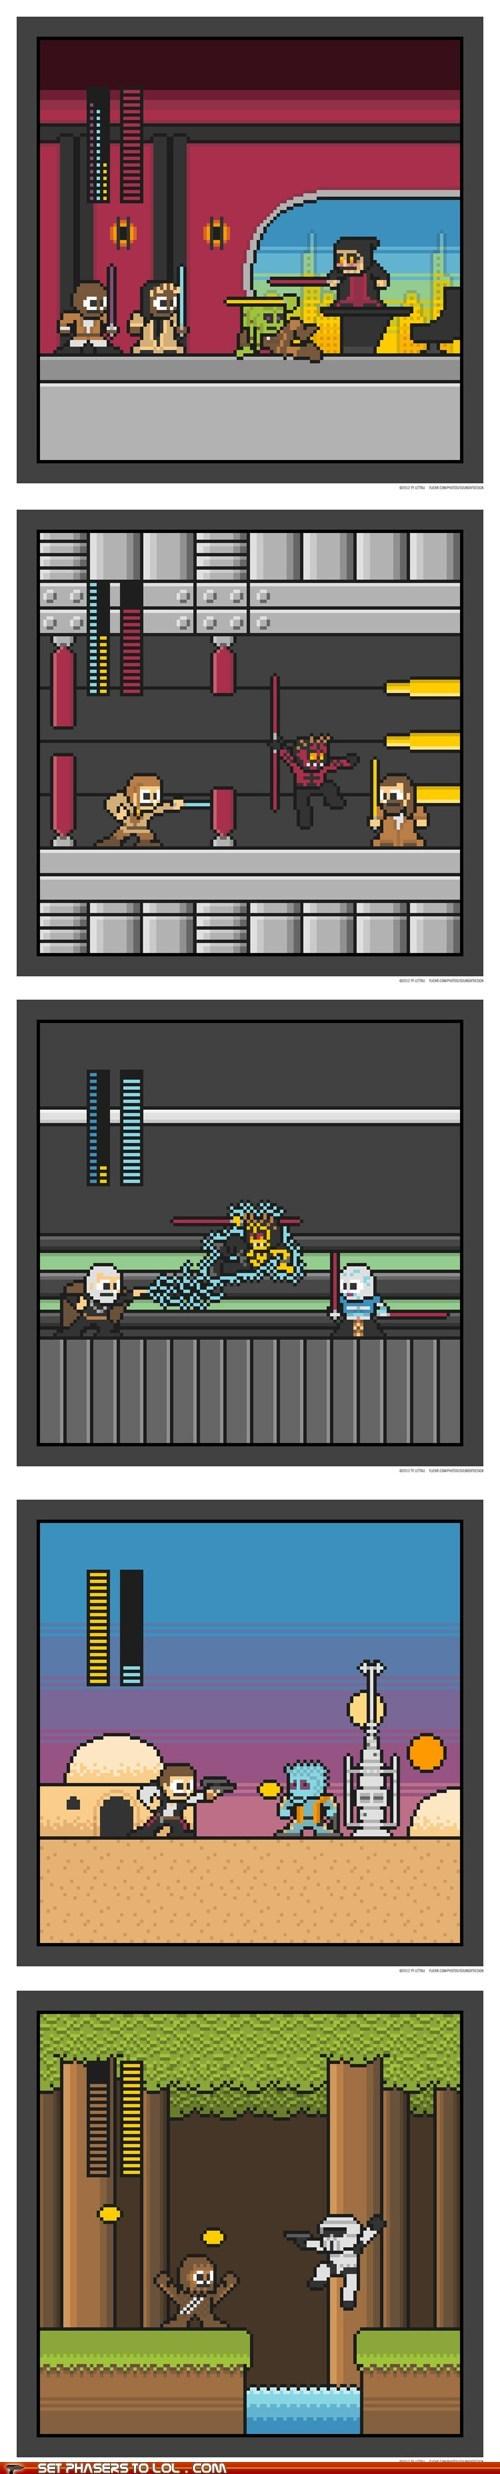 8 bit boss battles Fan Art mashup mega man NES star wars